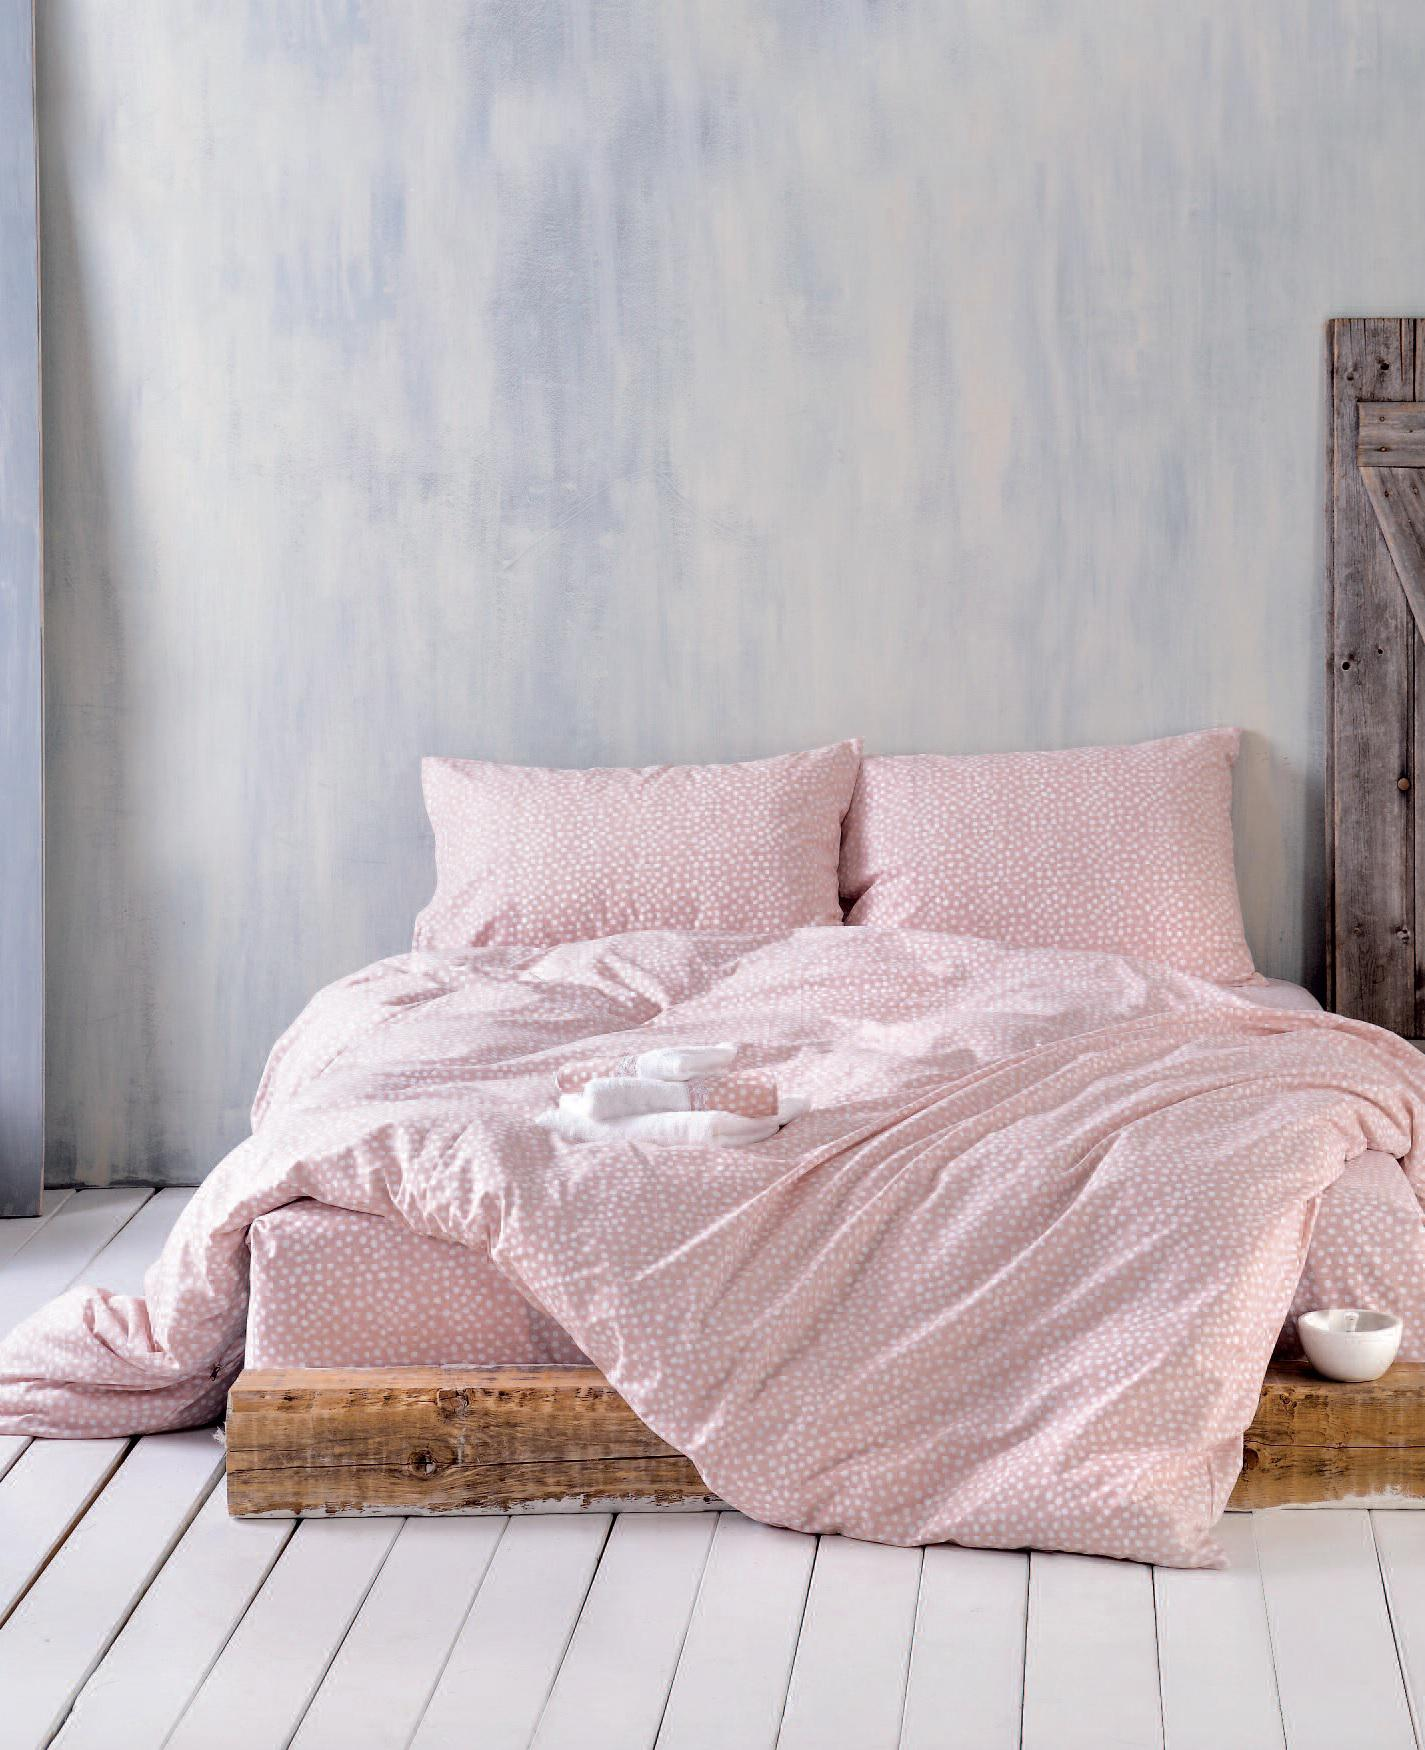 Rythmos Cute Ροζ – Σετ Παπλωματοθηκη Symbol Ημιδιπλο (160X250)